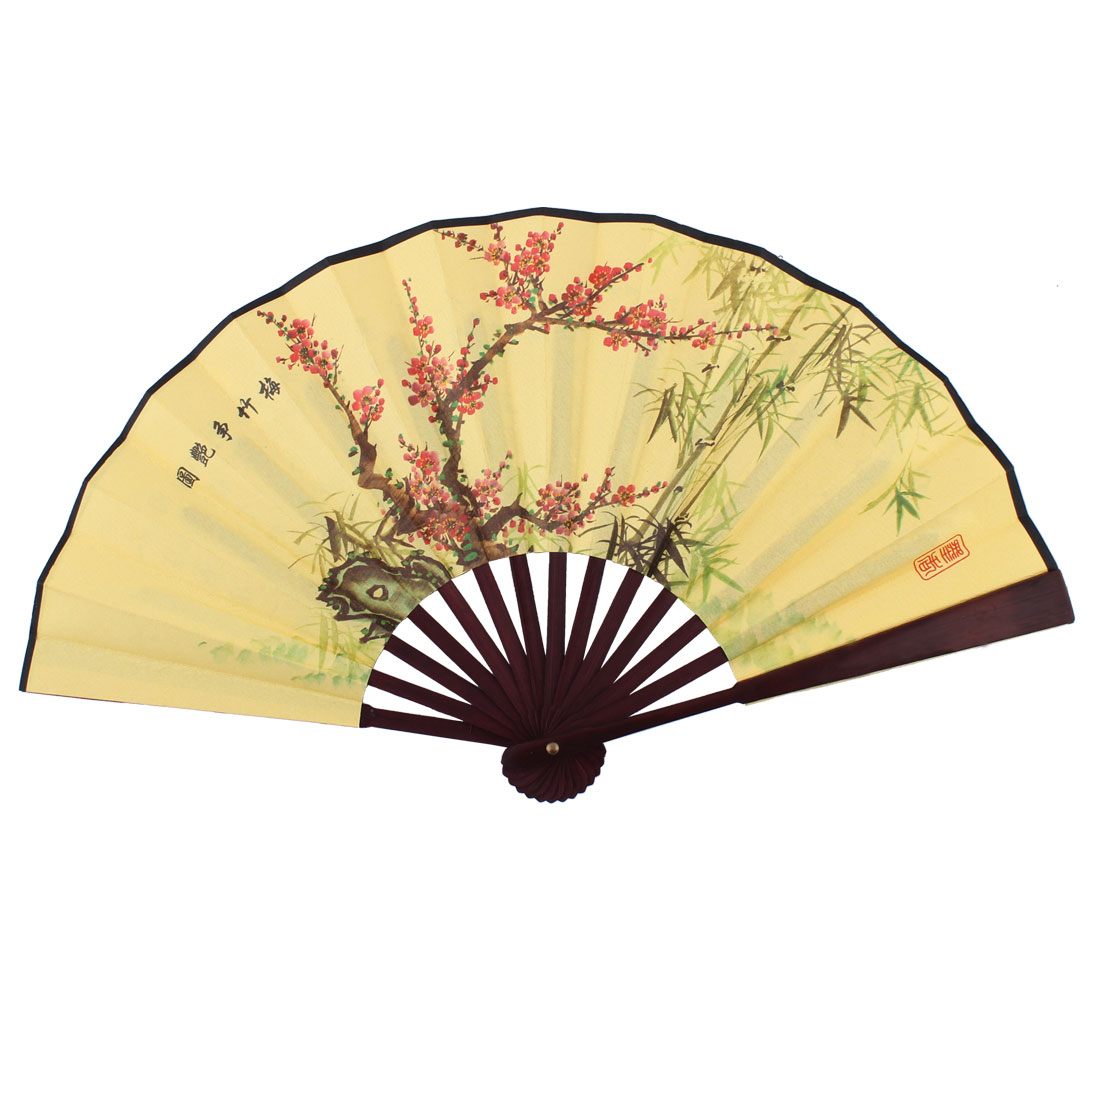 Lady Plum Flower Bamboo Pattern Chinese Style Summer Folding Handheld Fan